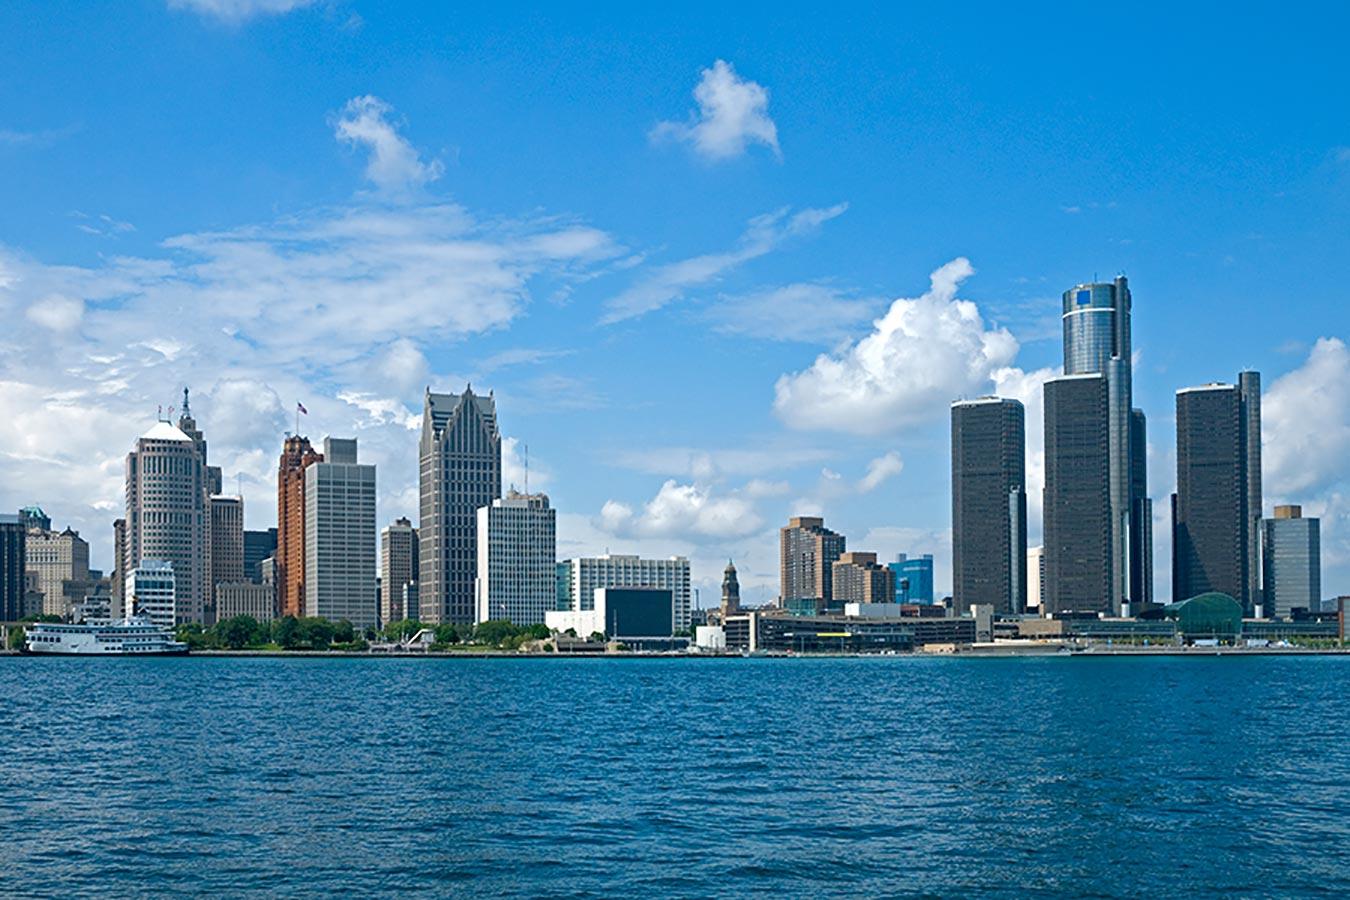 https://secureservercdn.net/192.169.222.215/j4y.c53.myftpupload.com/wp-content/uploads/2018/12/Detroit-Michigan-Skyline.jpg?time=1616080342